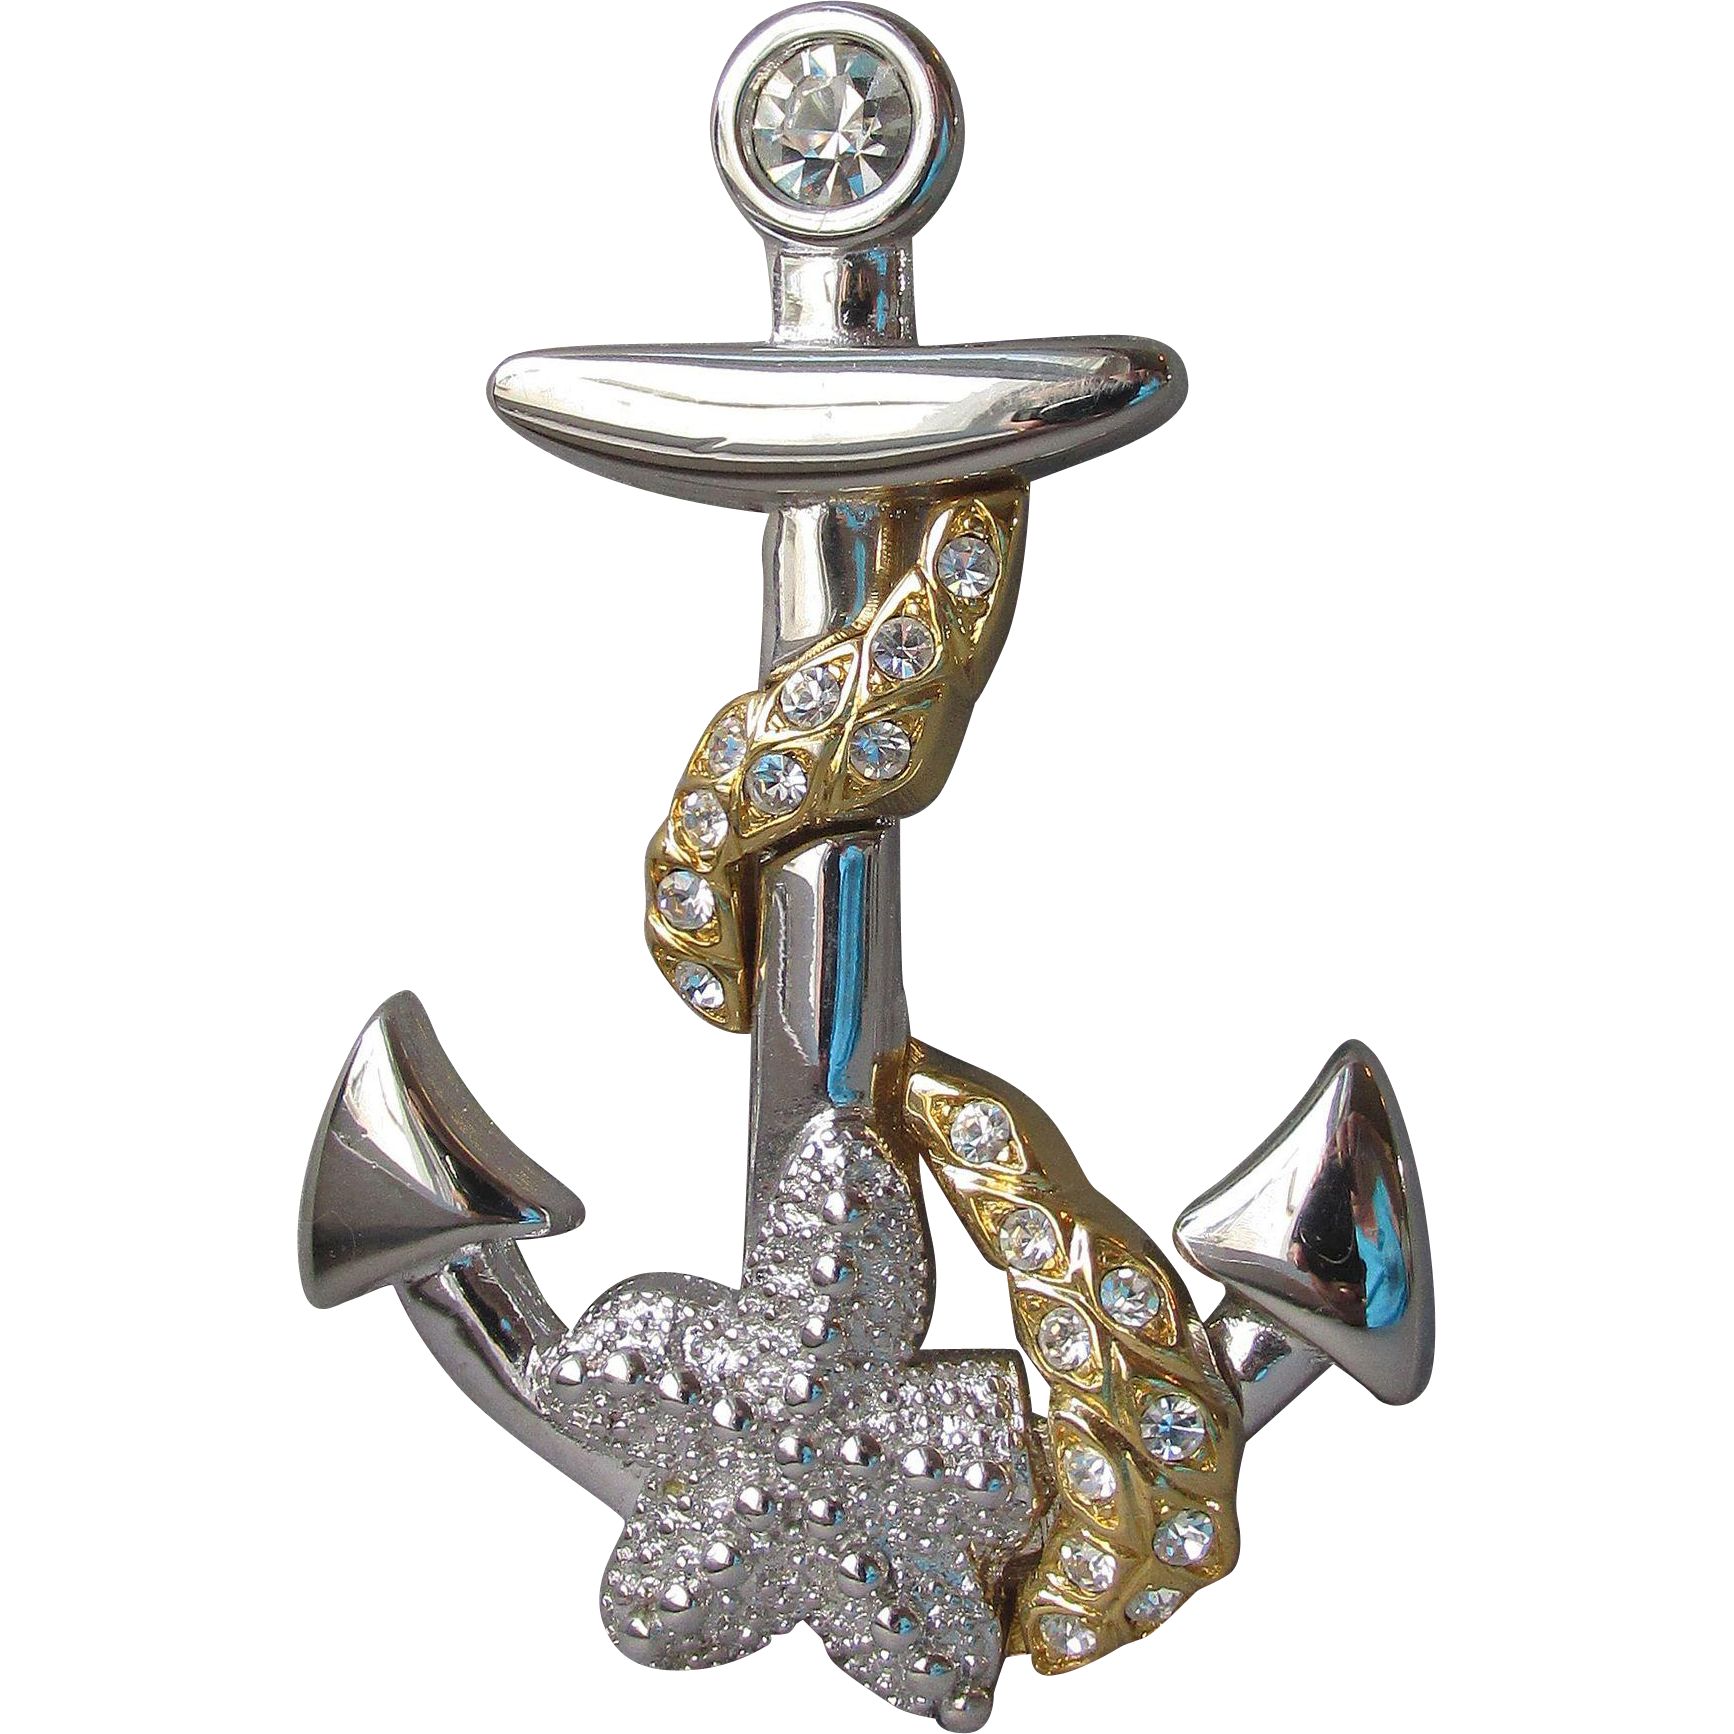 BIG Vintage Kenneth Jay Lane Nautical Pin or Pendant, Rhinestone Gold Tone Anchor, Rope & Starfish Brooch